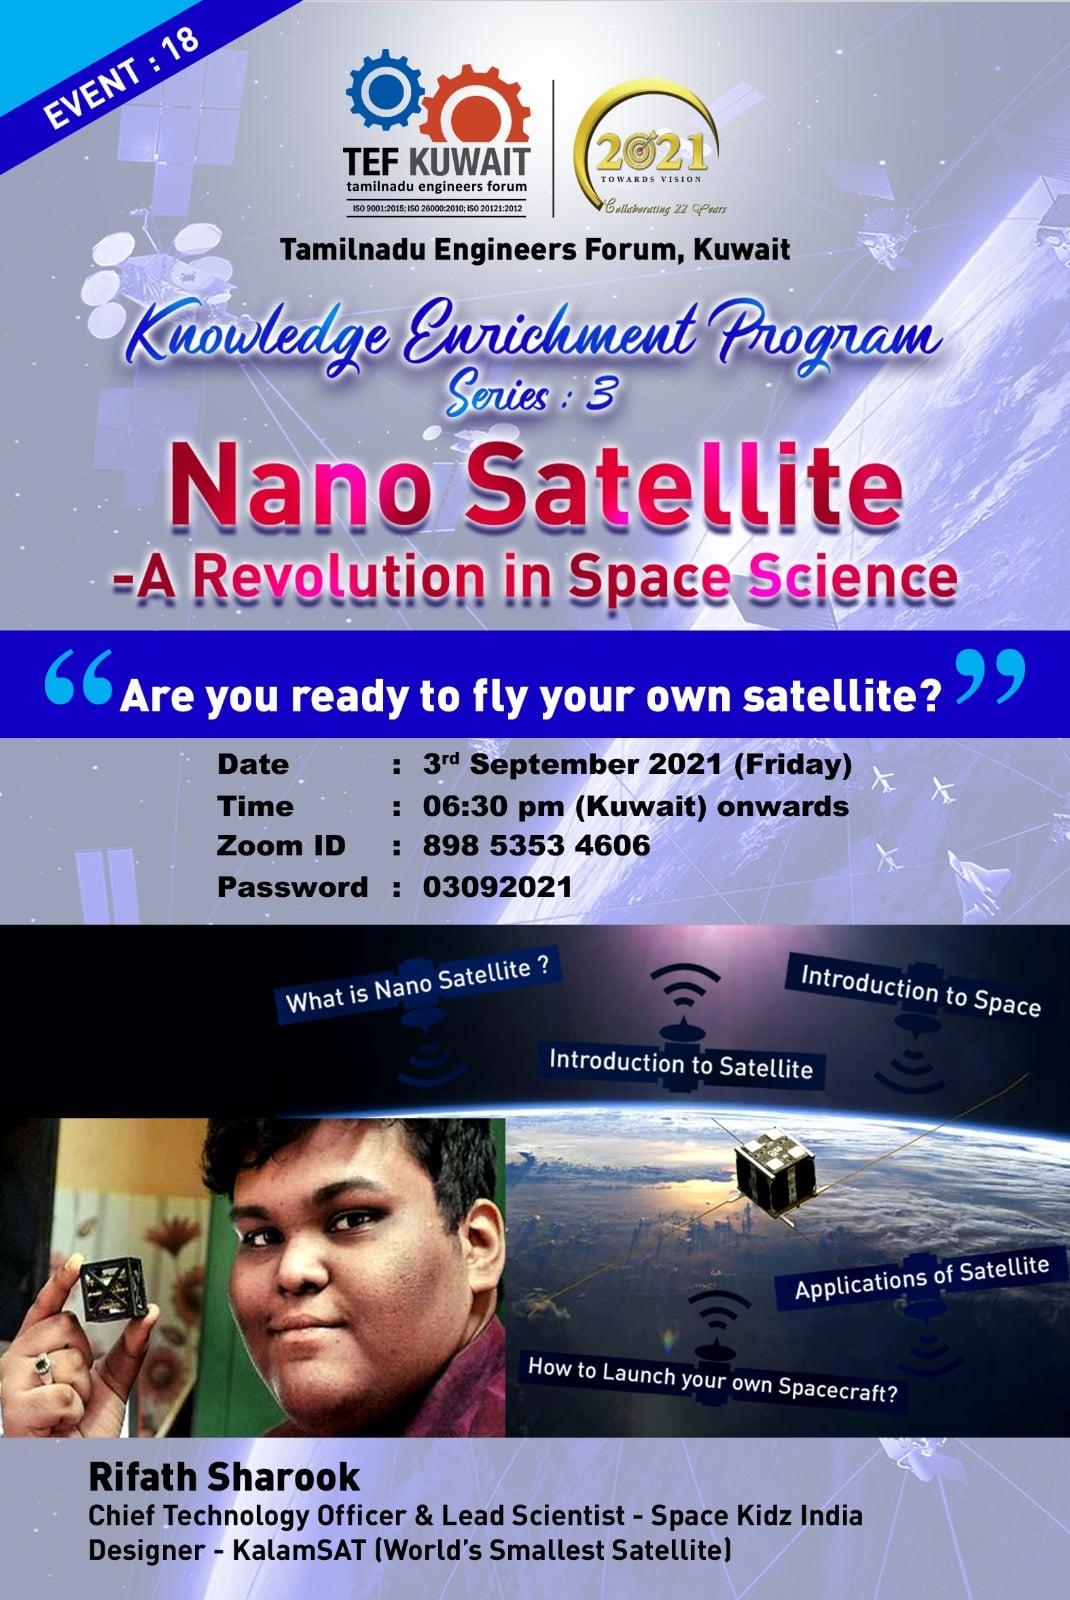 1 - 18 | Nano Satellite - A revolution in Space science